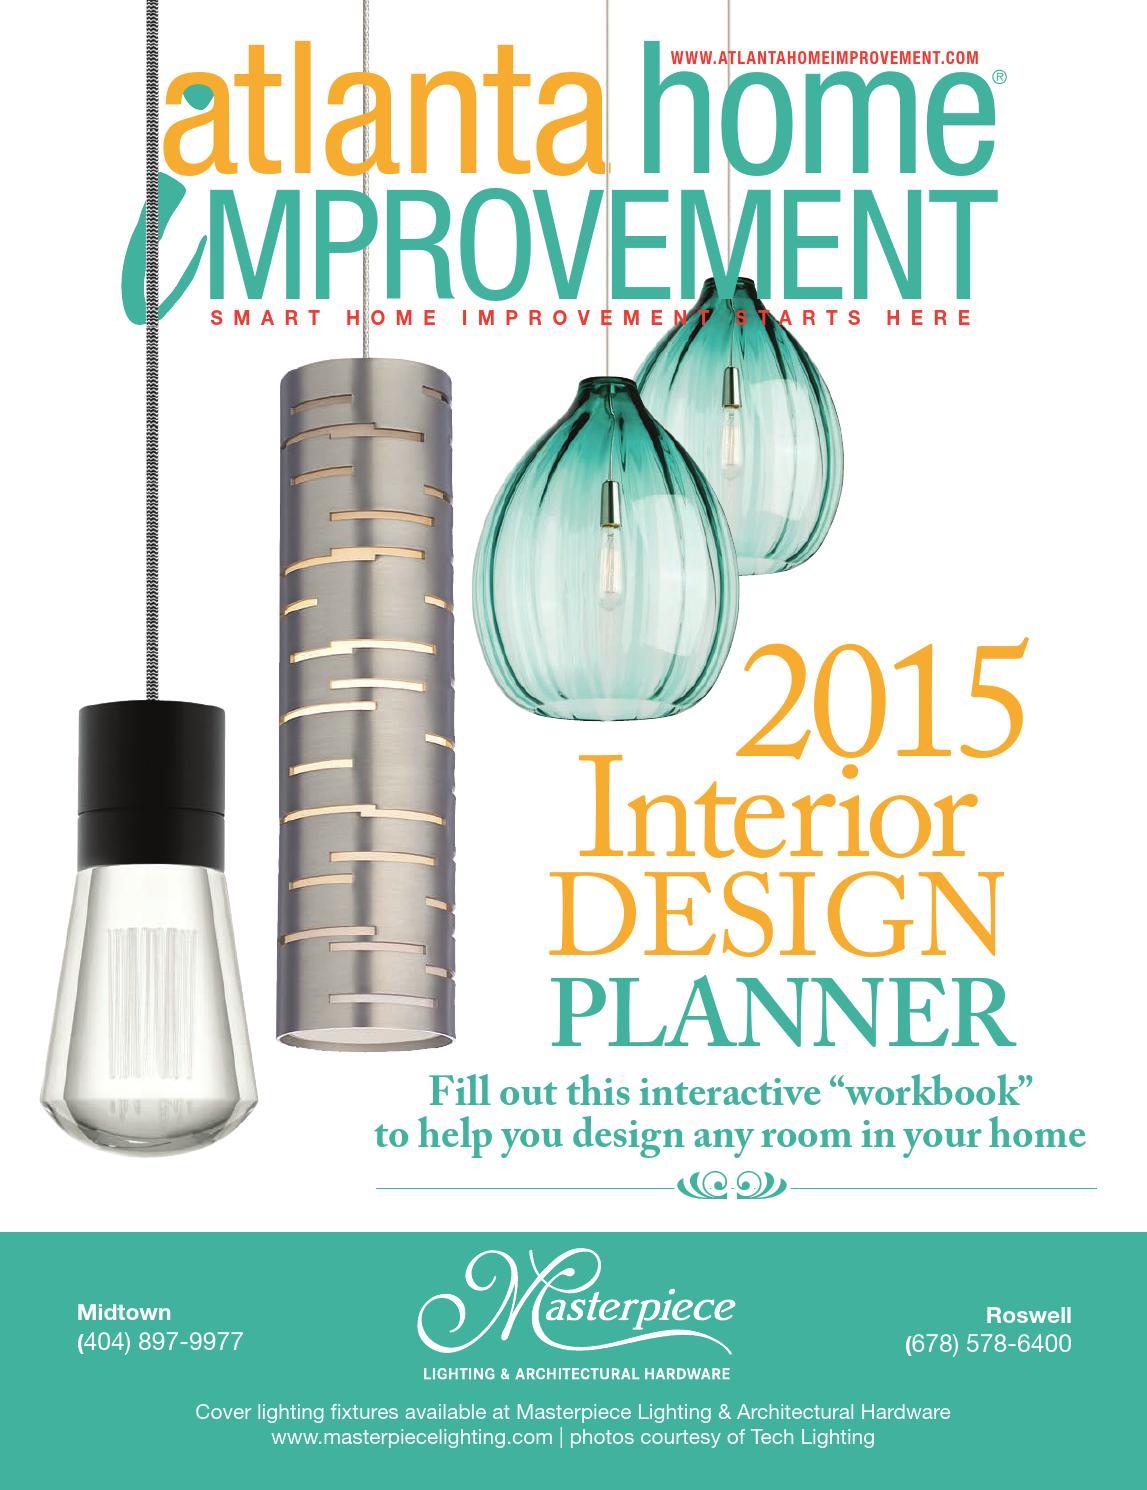 atlanta home improvement magazine 2015 interior design planner by my